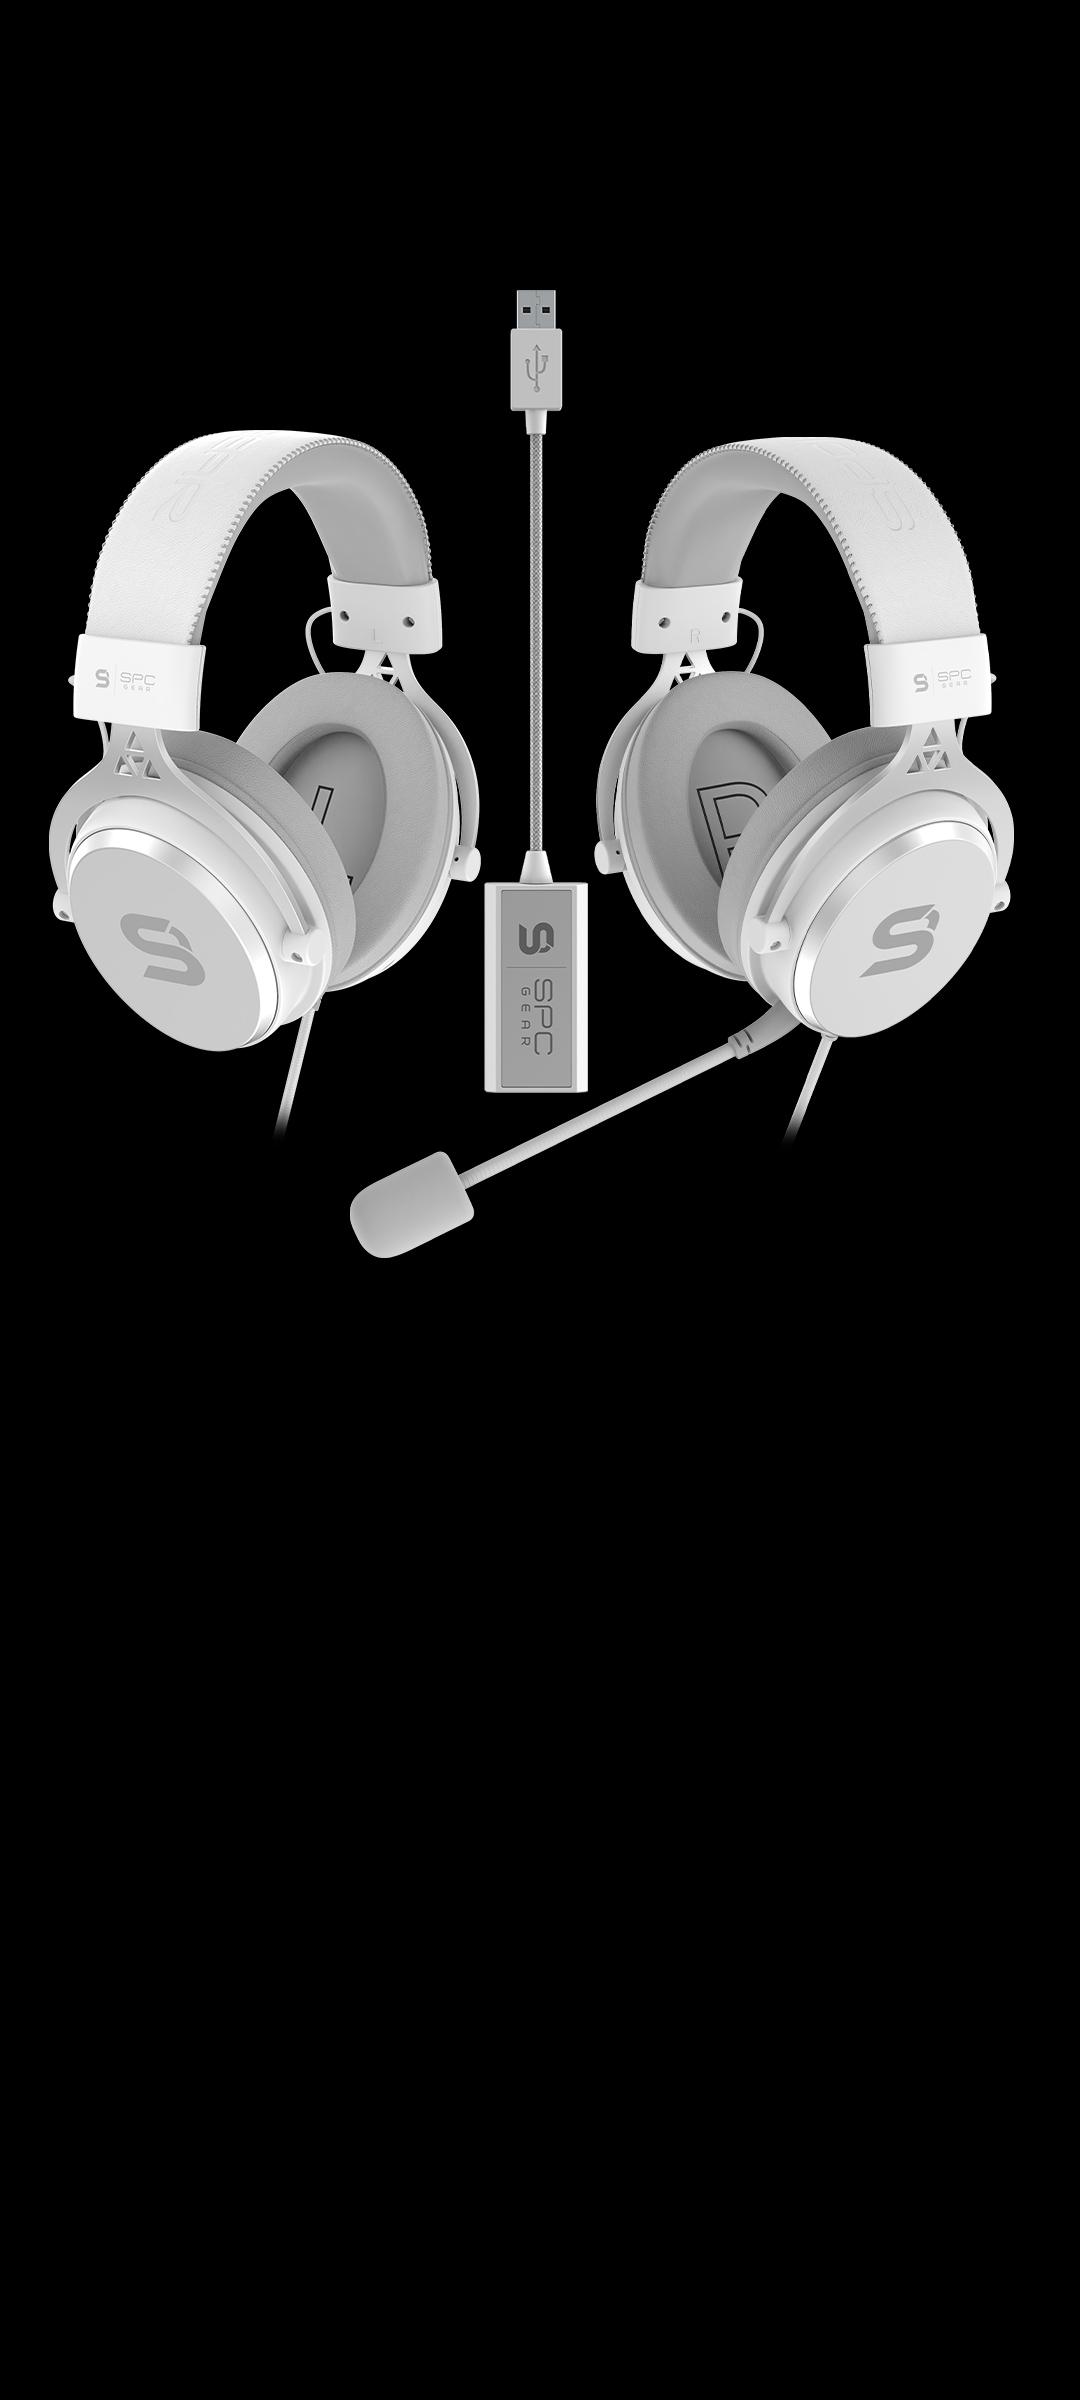 SPC Gear VIRO and VIRO Plus Onyx White edition